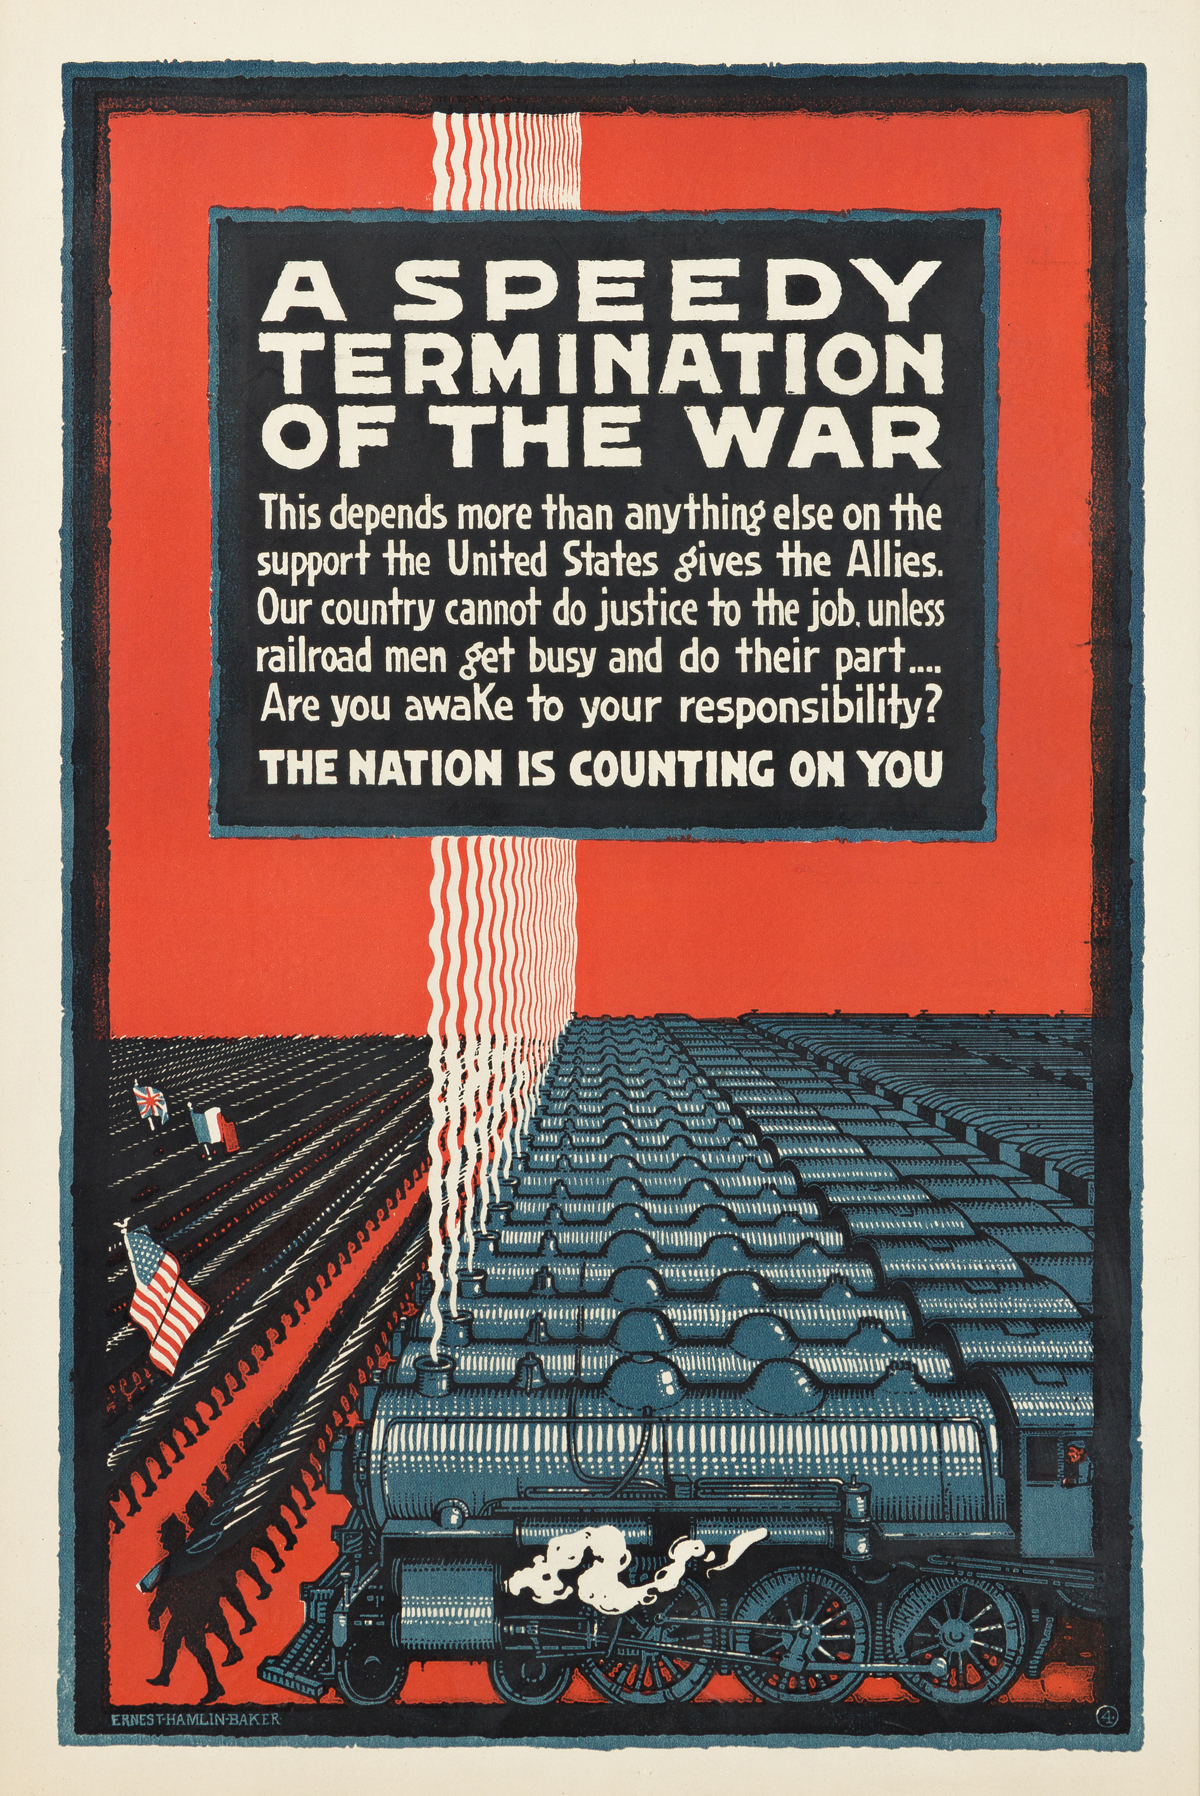 ERNEST HAMLIN BAKER (1889-1975).  A SPEEDY TERMINATION OF THE WAR. Small format poster. Circa 1917. 17¾x12 inches, 45x30½ cm.